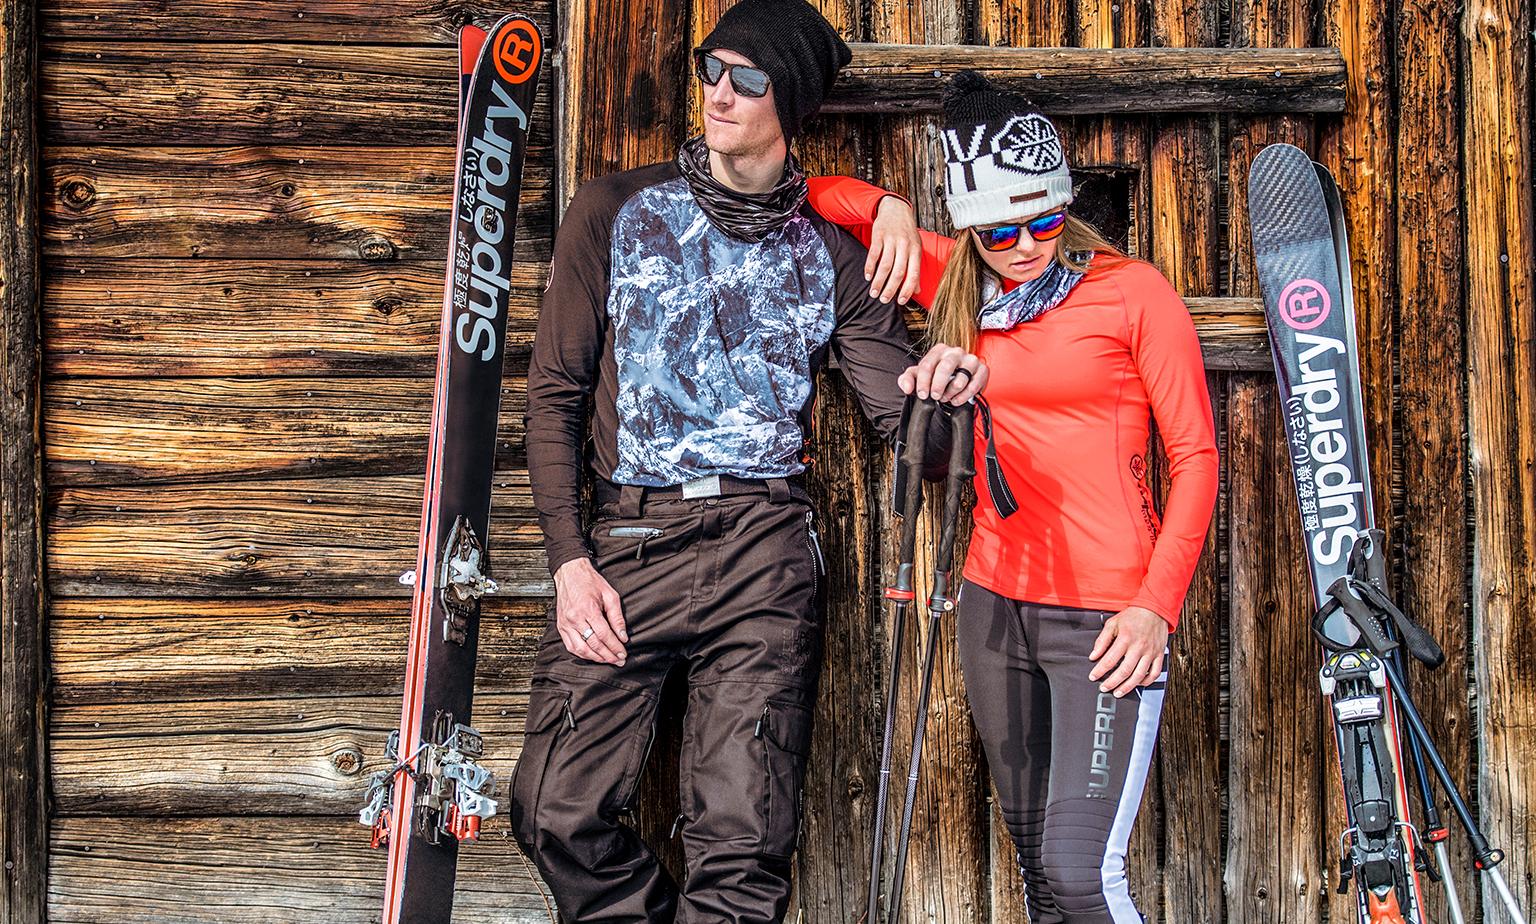 Upto 60% off Superdry snow, skiing & sports wear eg running leggings £11.99, Sport backpacks £15.99, Vest tops £8.99 @ eBay / Superdry